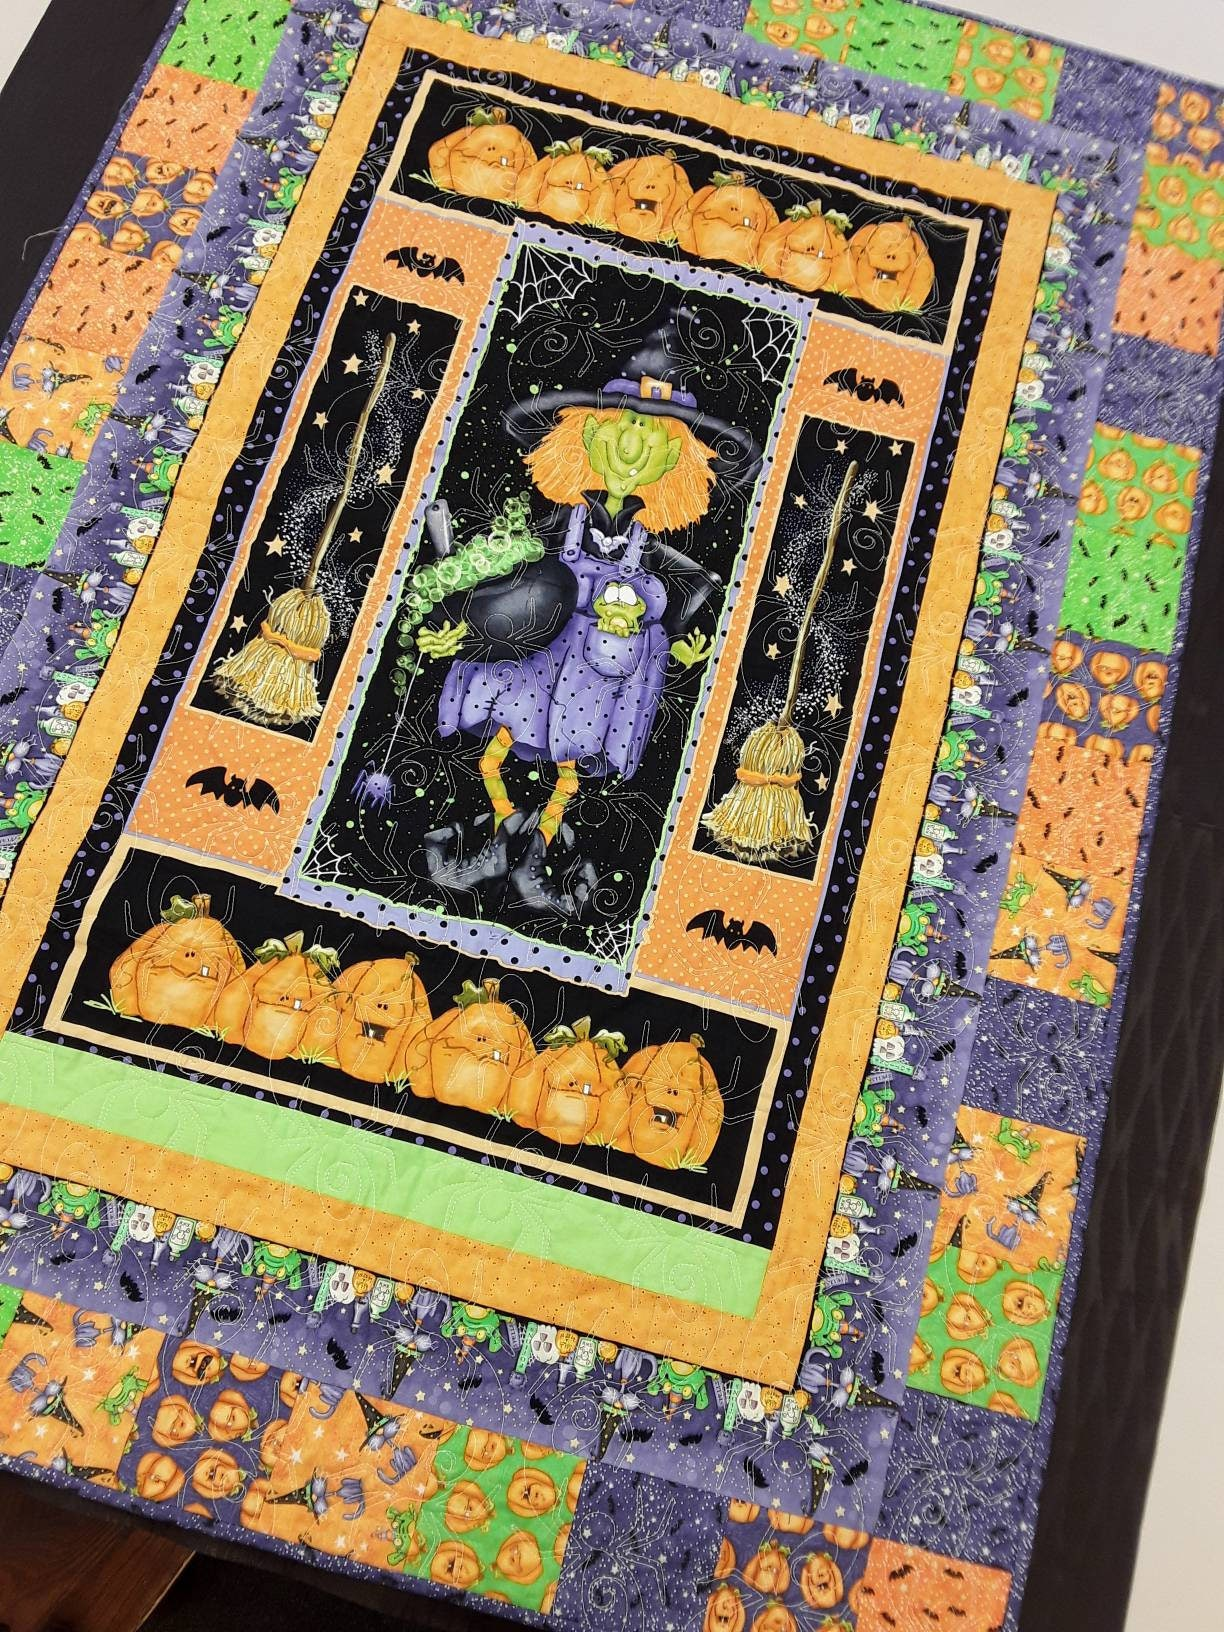 Line Art Quilt Kit : Halloween quilt kit wall art of witches brooms bats